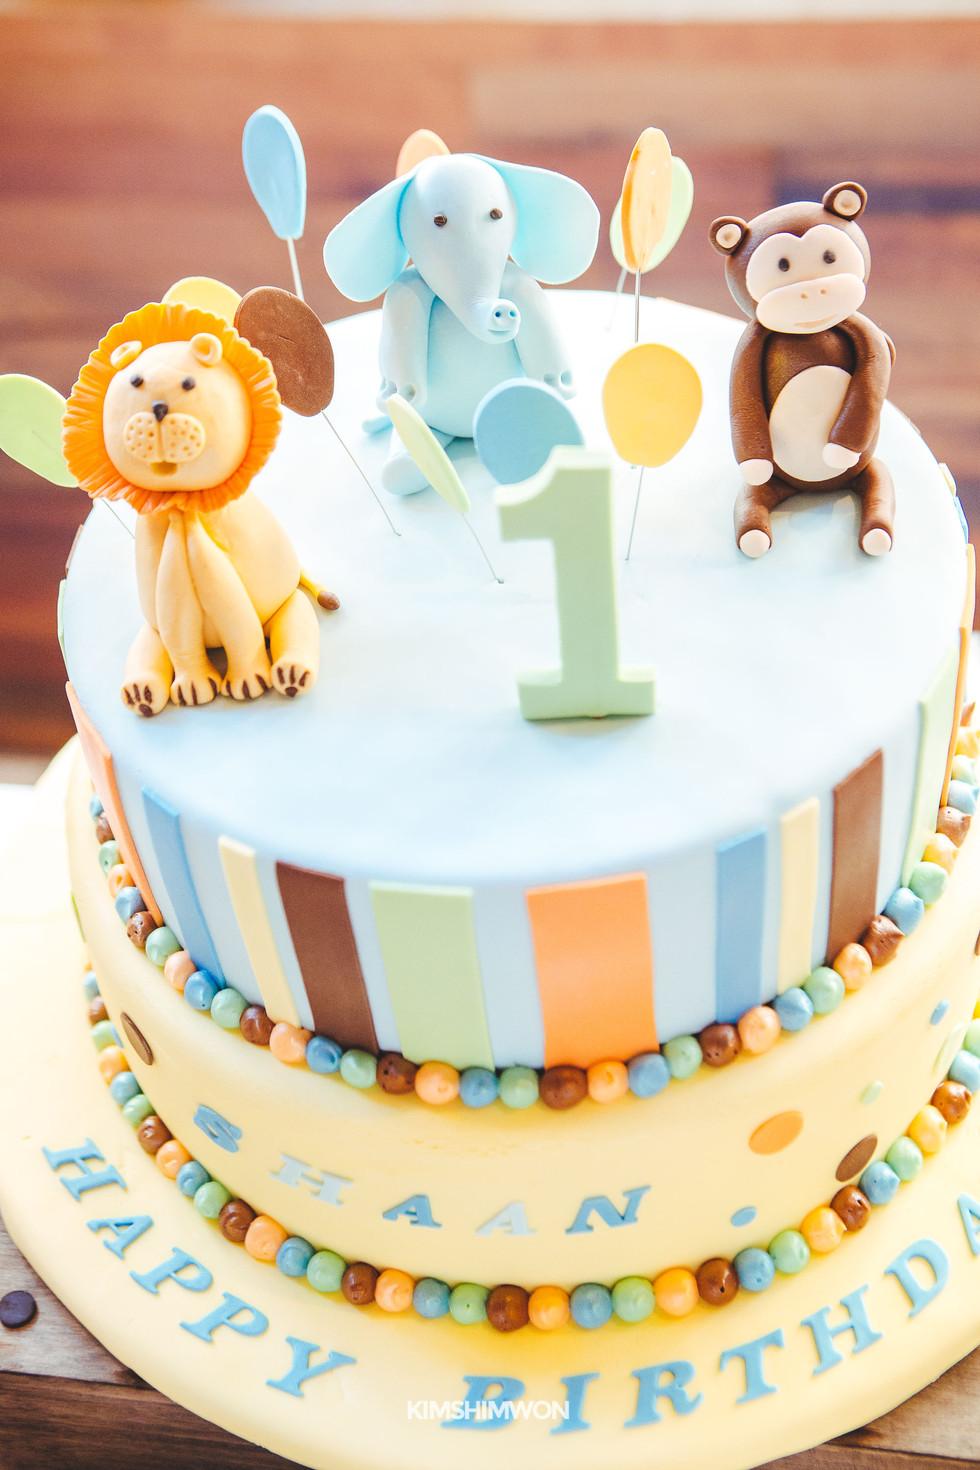 Shaan First Birthday 10.15.16-48.jpg